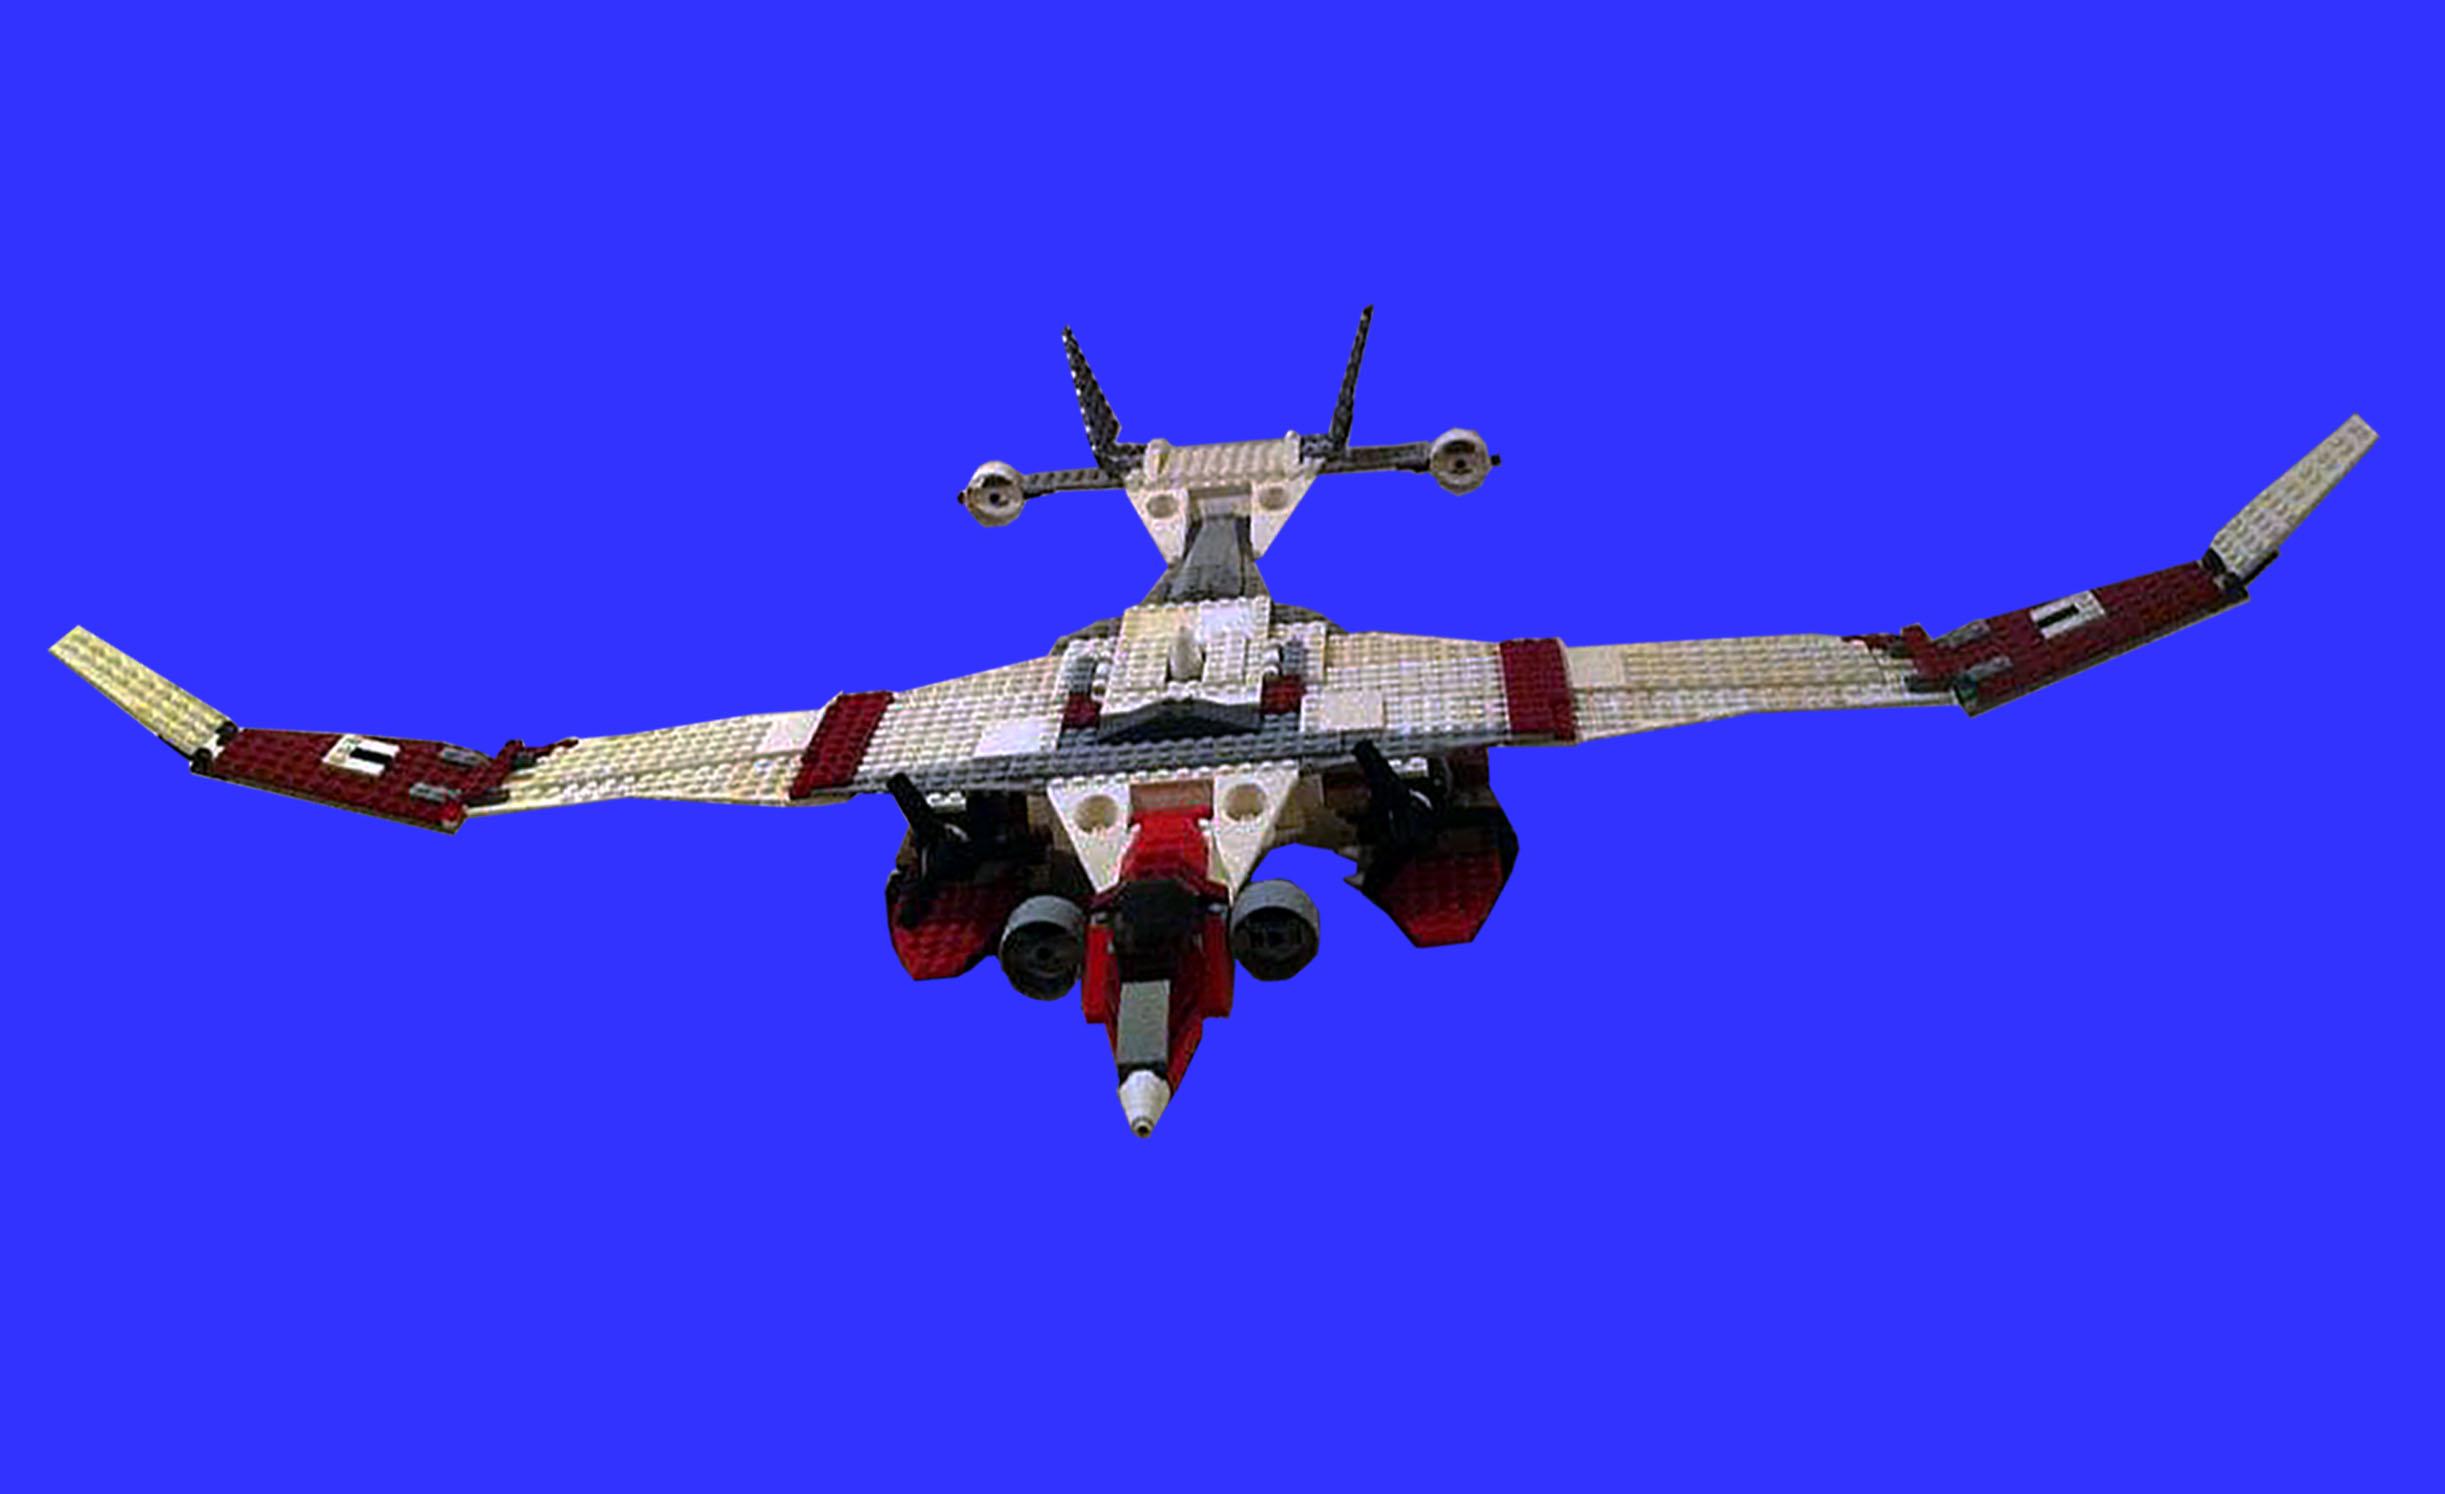 NASA/LEGO Contest Names Winning Designs | NASA